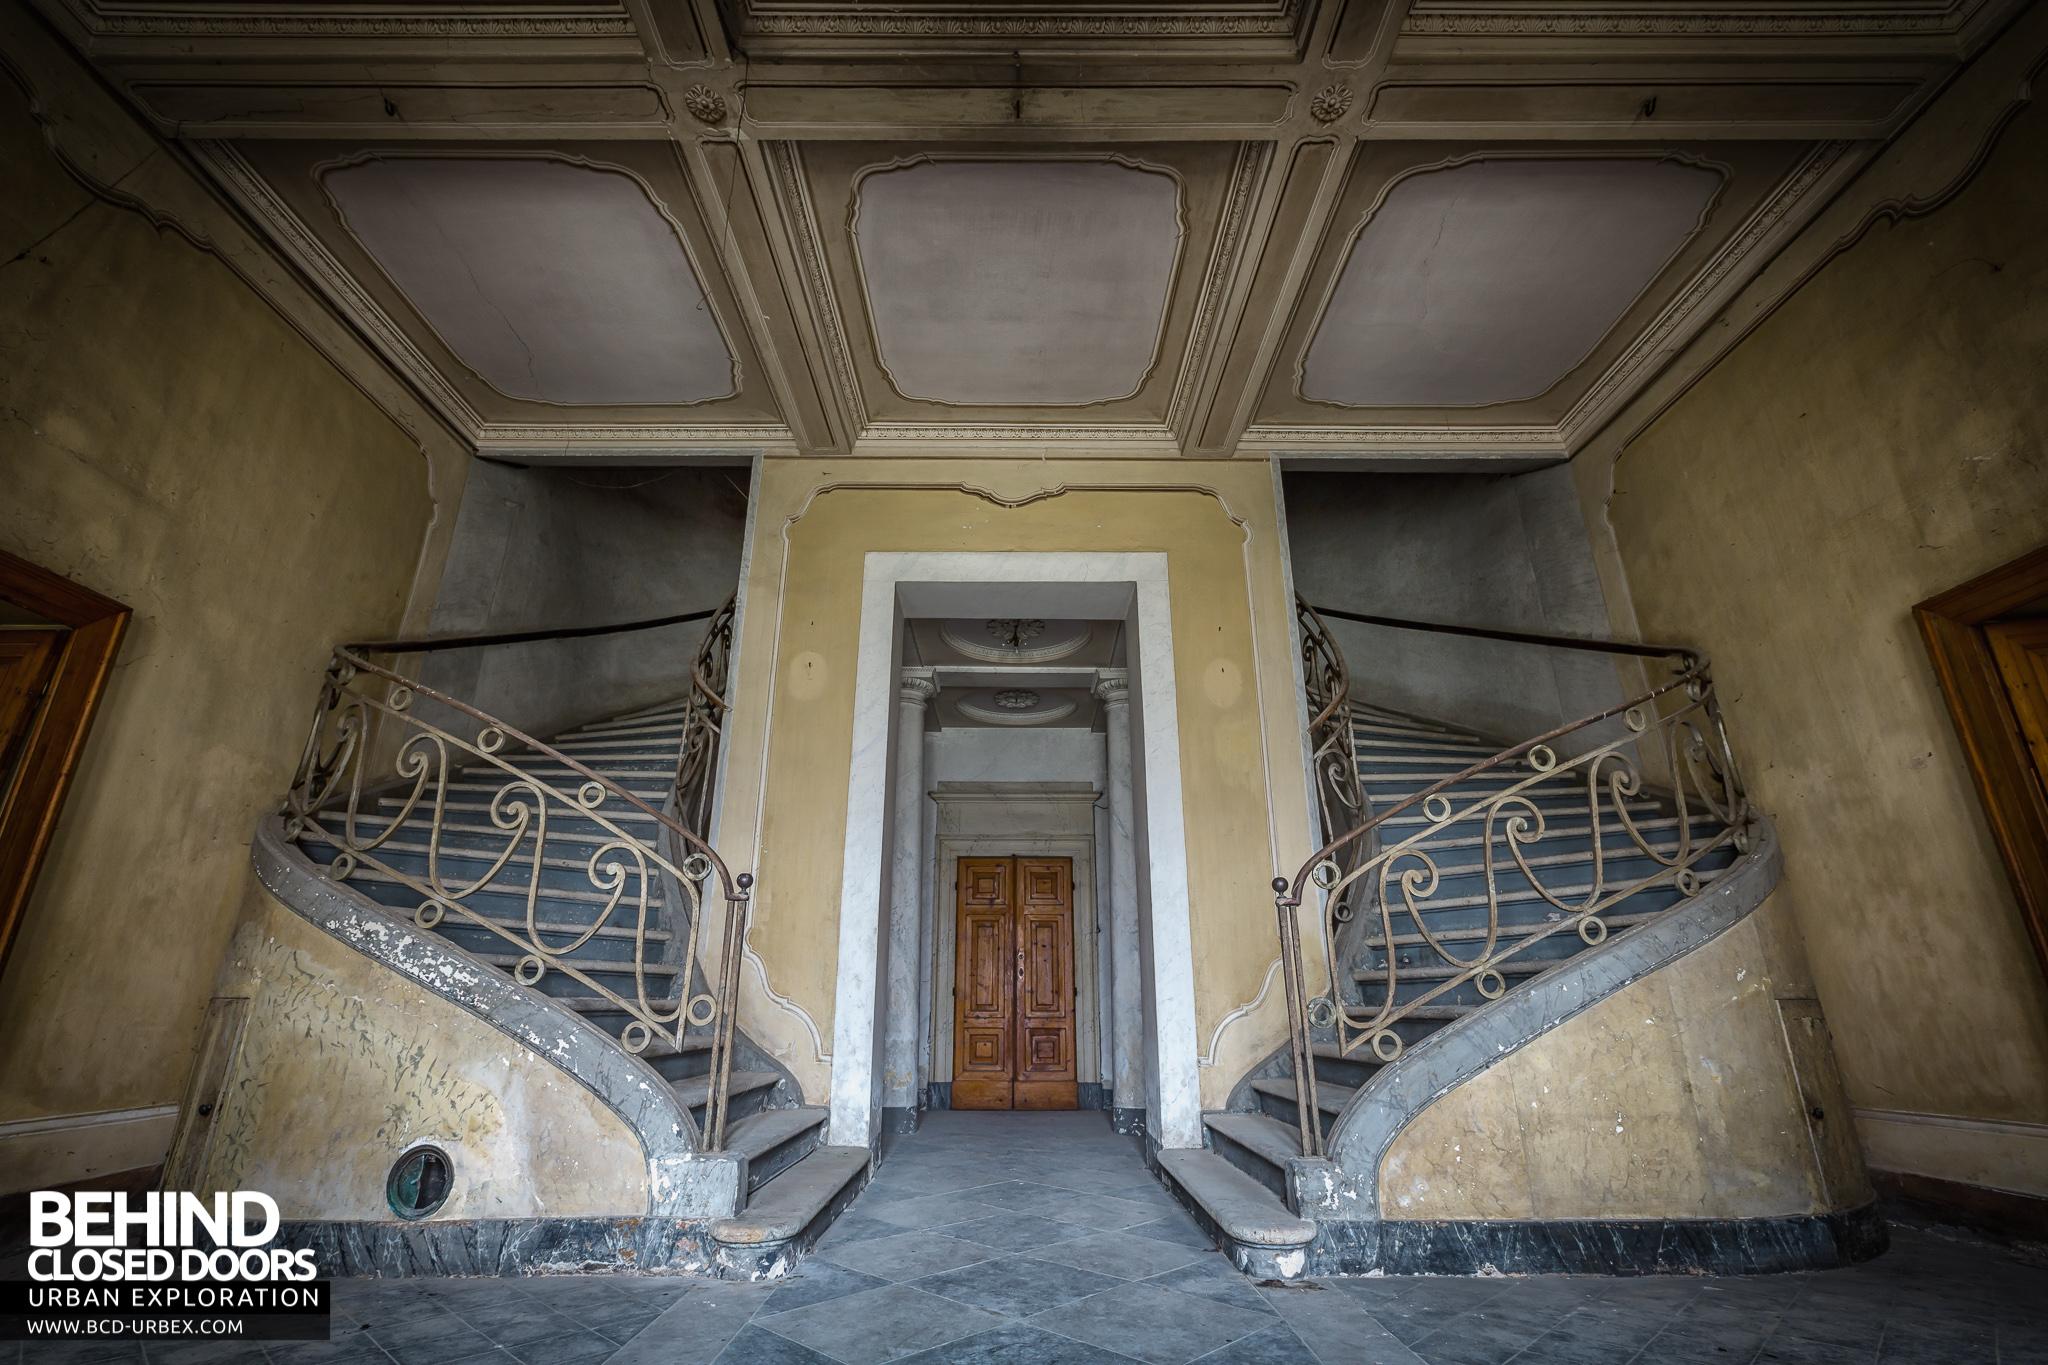 Palace Casino Italy 187 Urbex Behind Closed Doors Urban Exploring Abandoned Locations